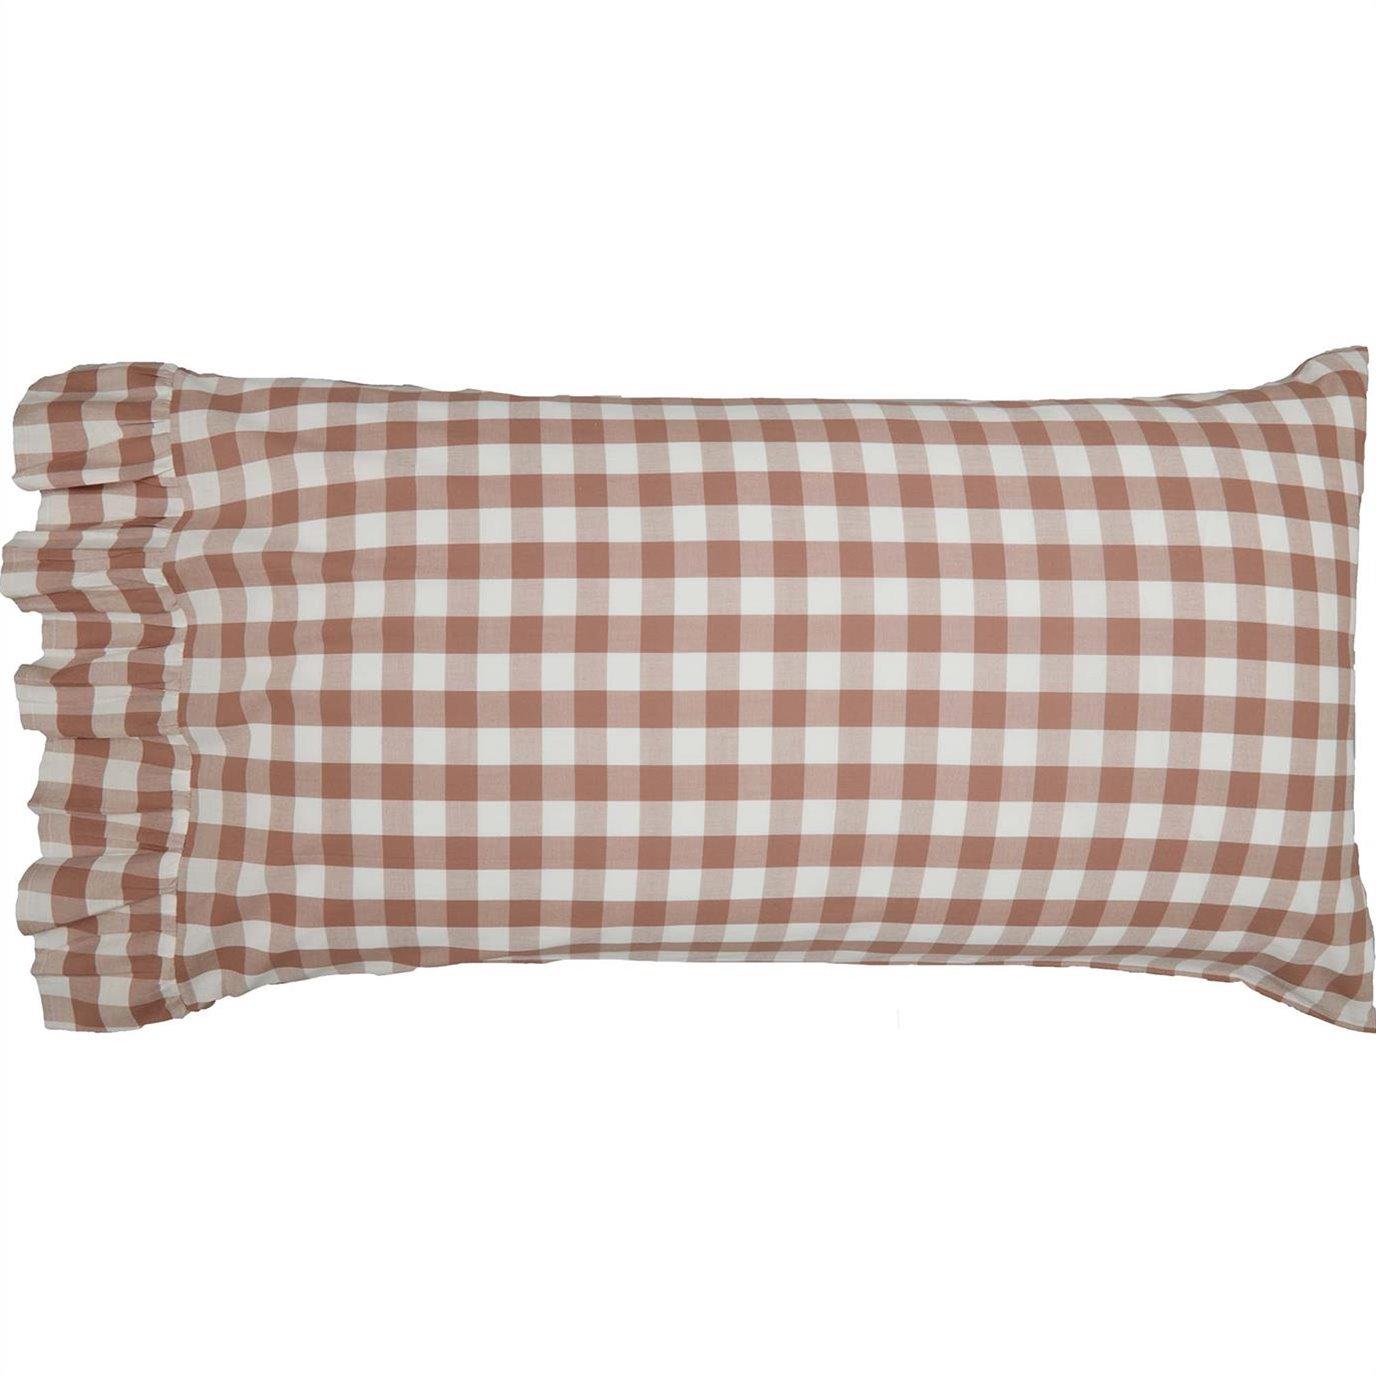 Annie Buffalo Portabella Check Standard Pillow Case Set of 2 21x30+4